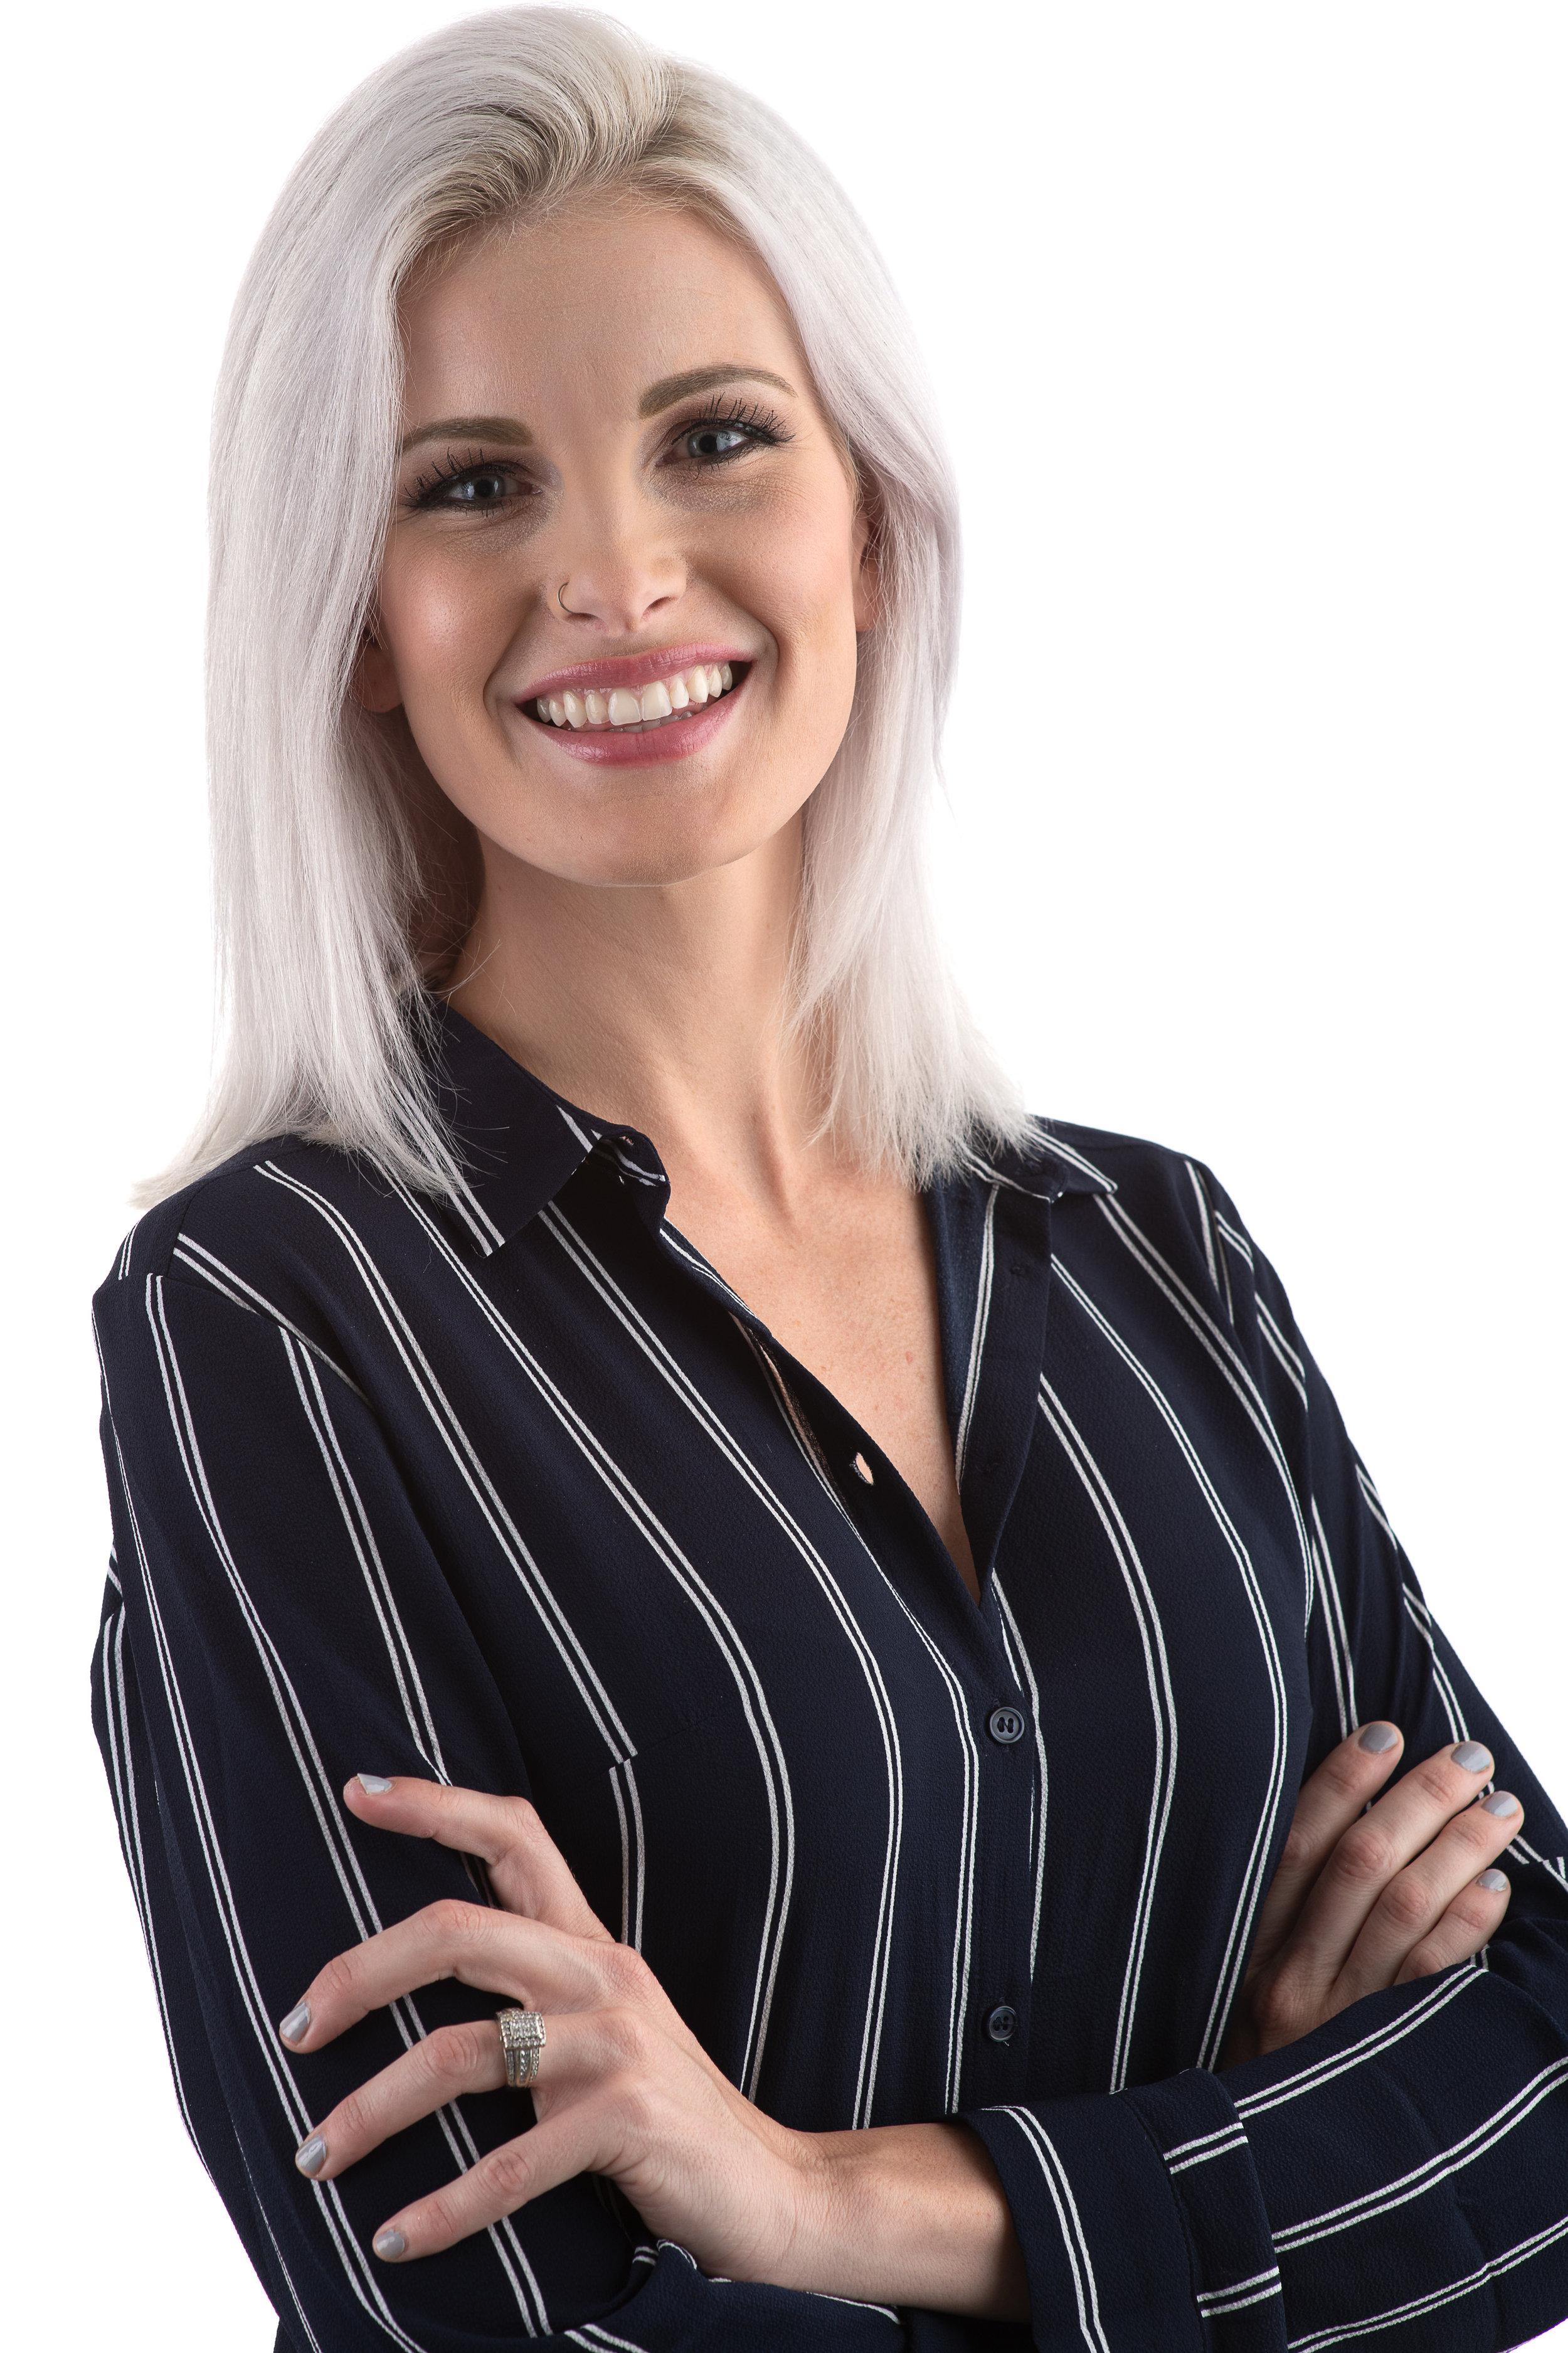 Headshot / Portrait Photography Offer